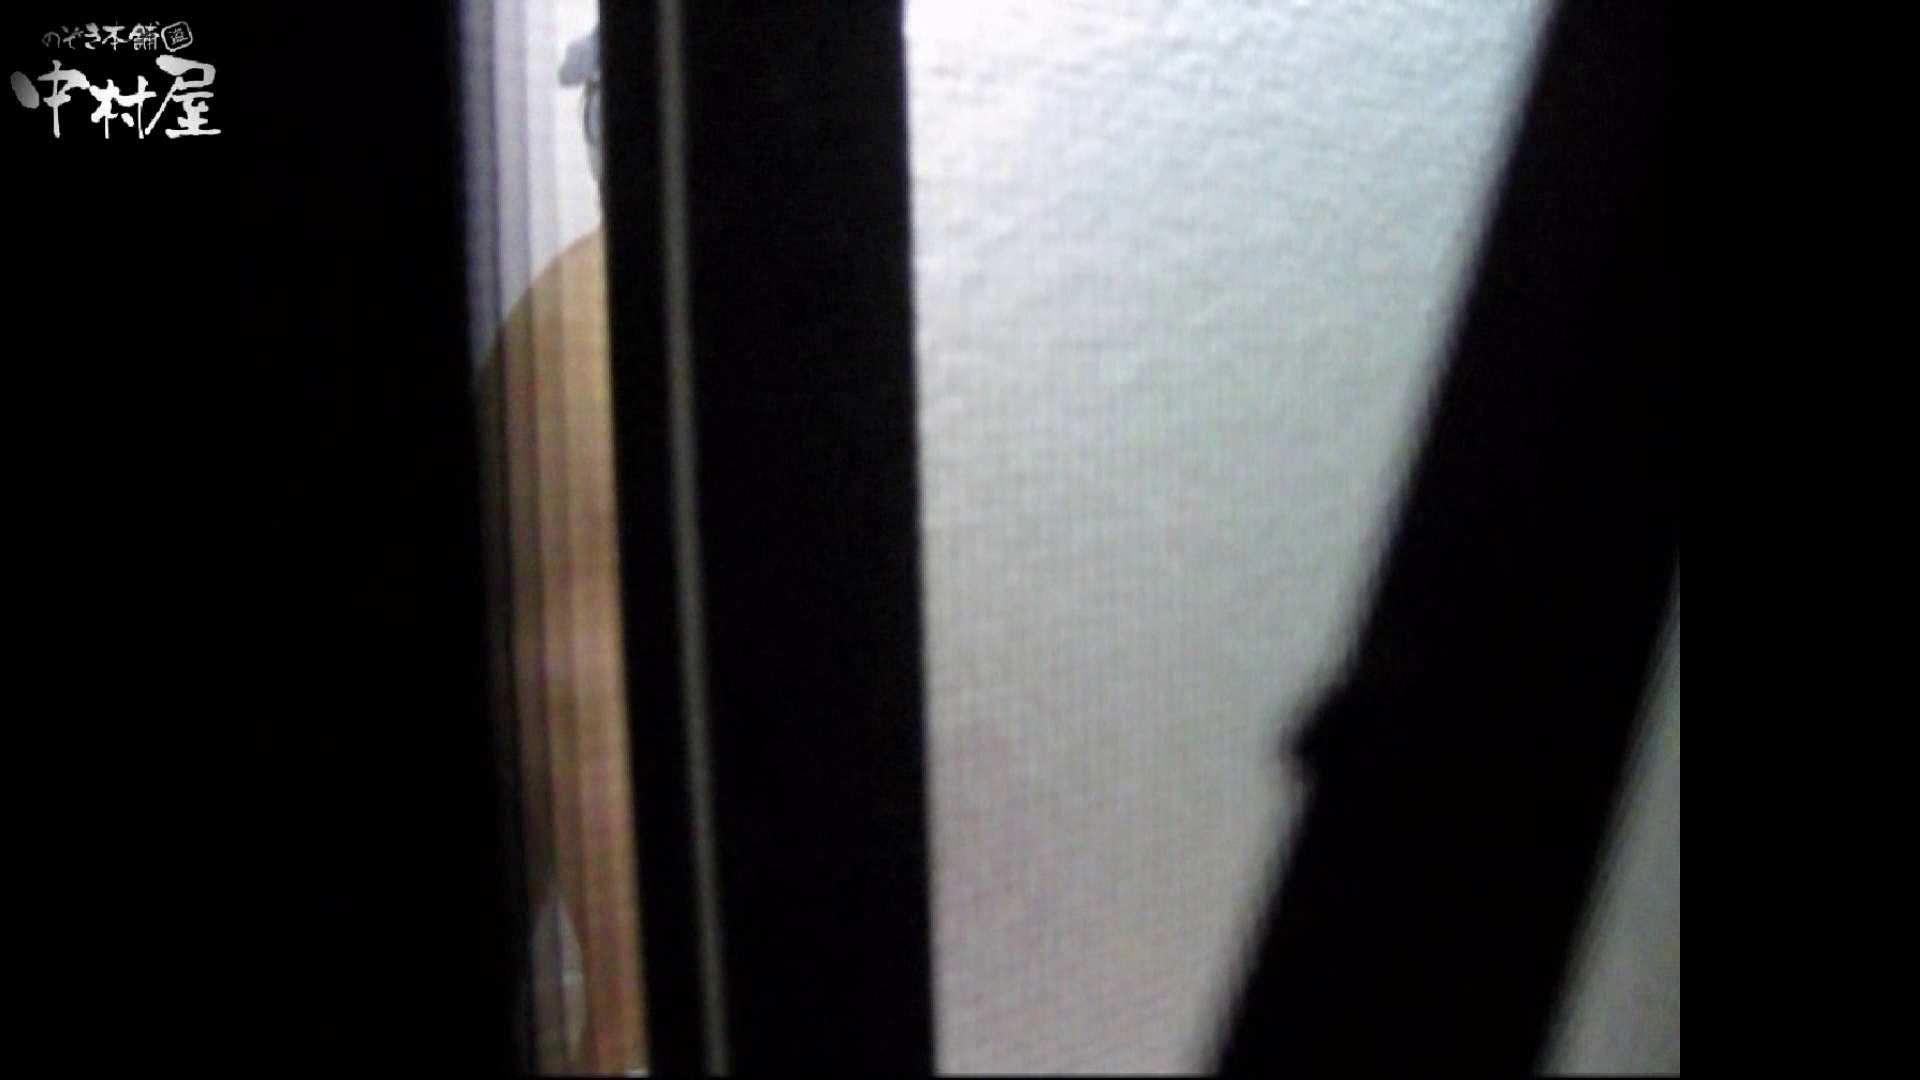 民家風呂専門盗撮師の超危険映像 vol.002 リアル股間  109Pix 69